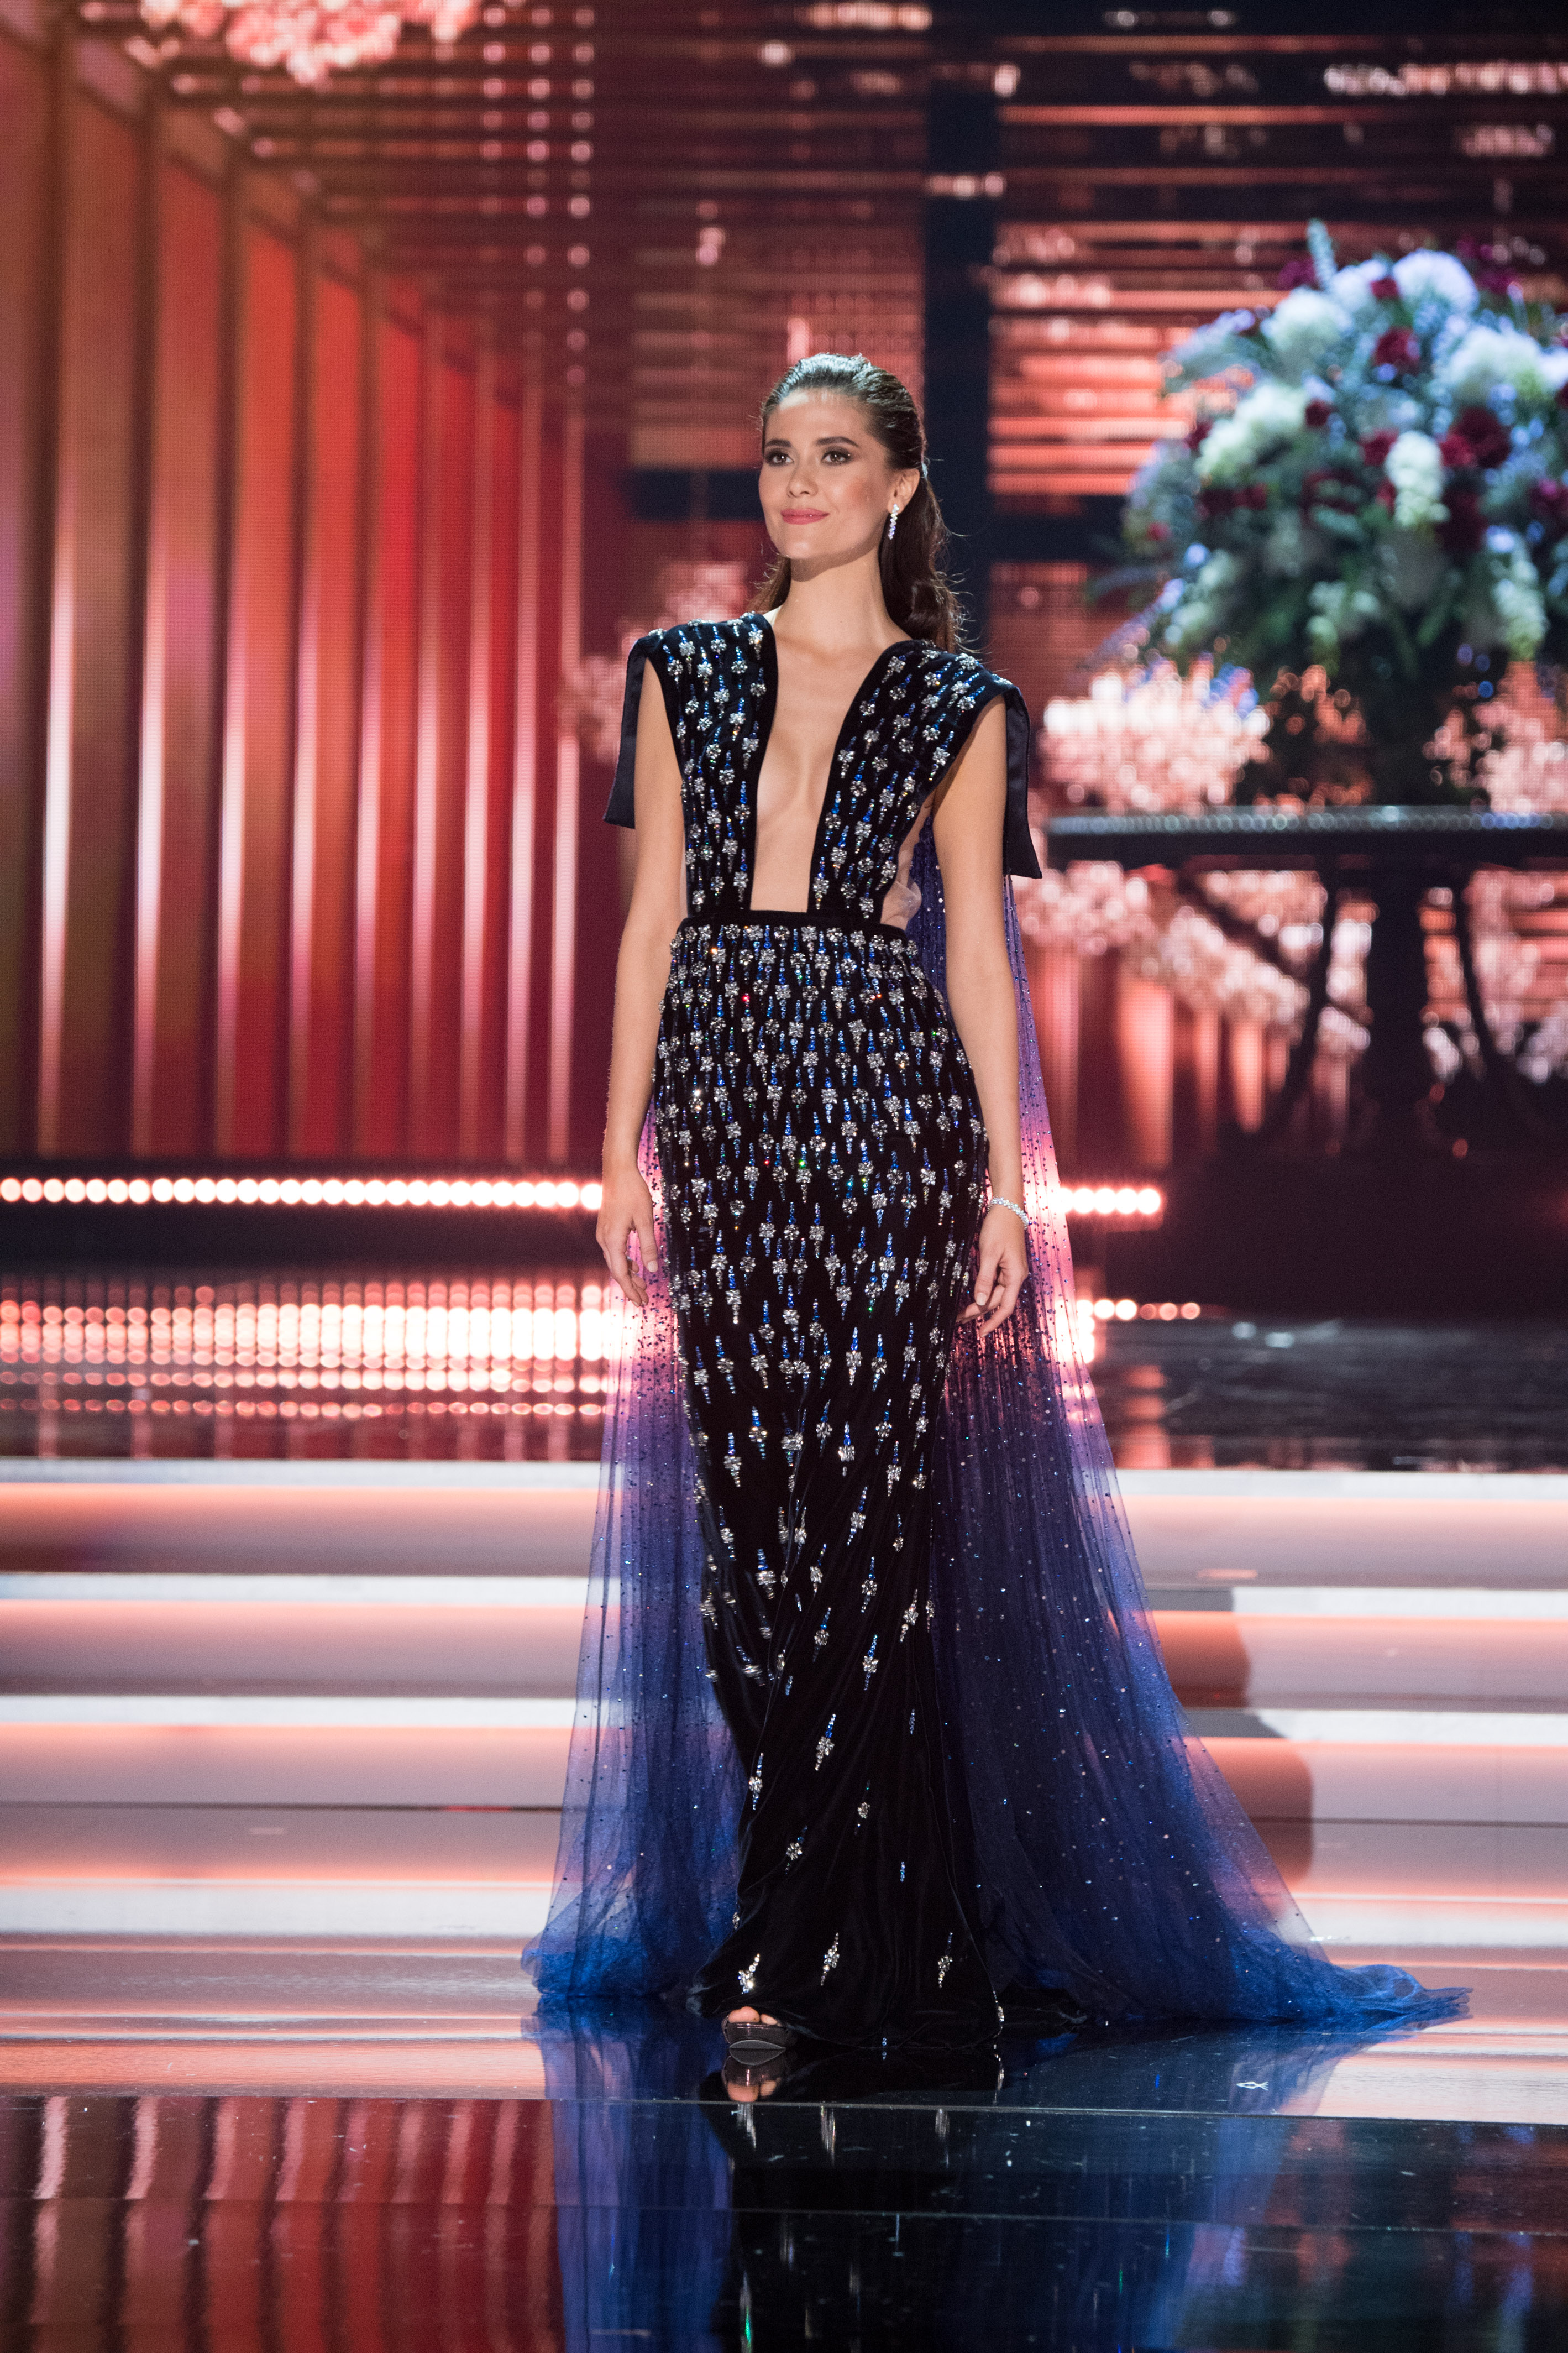 Miss Thailan 2017 Maria Poonlertlarp. Photo from the Miss Universe Organization